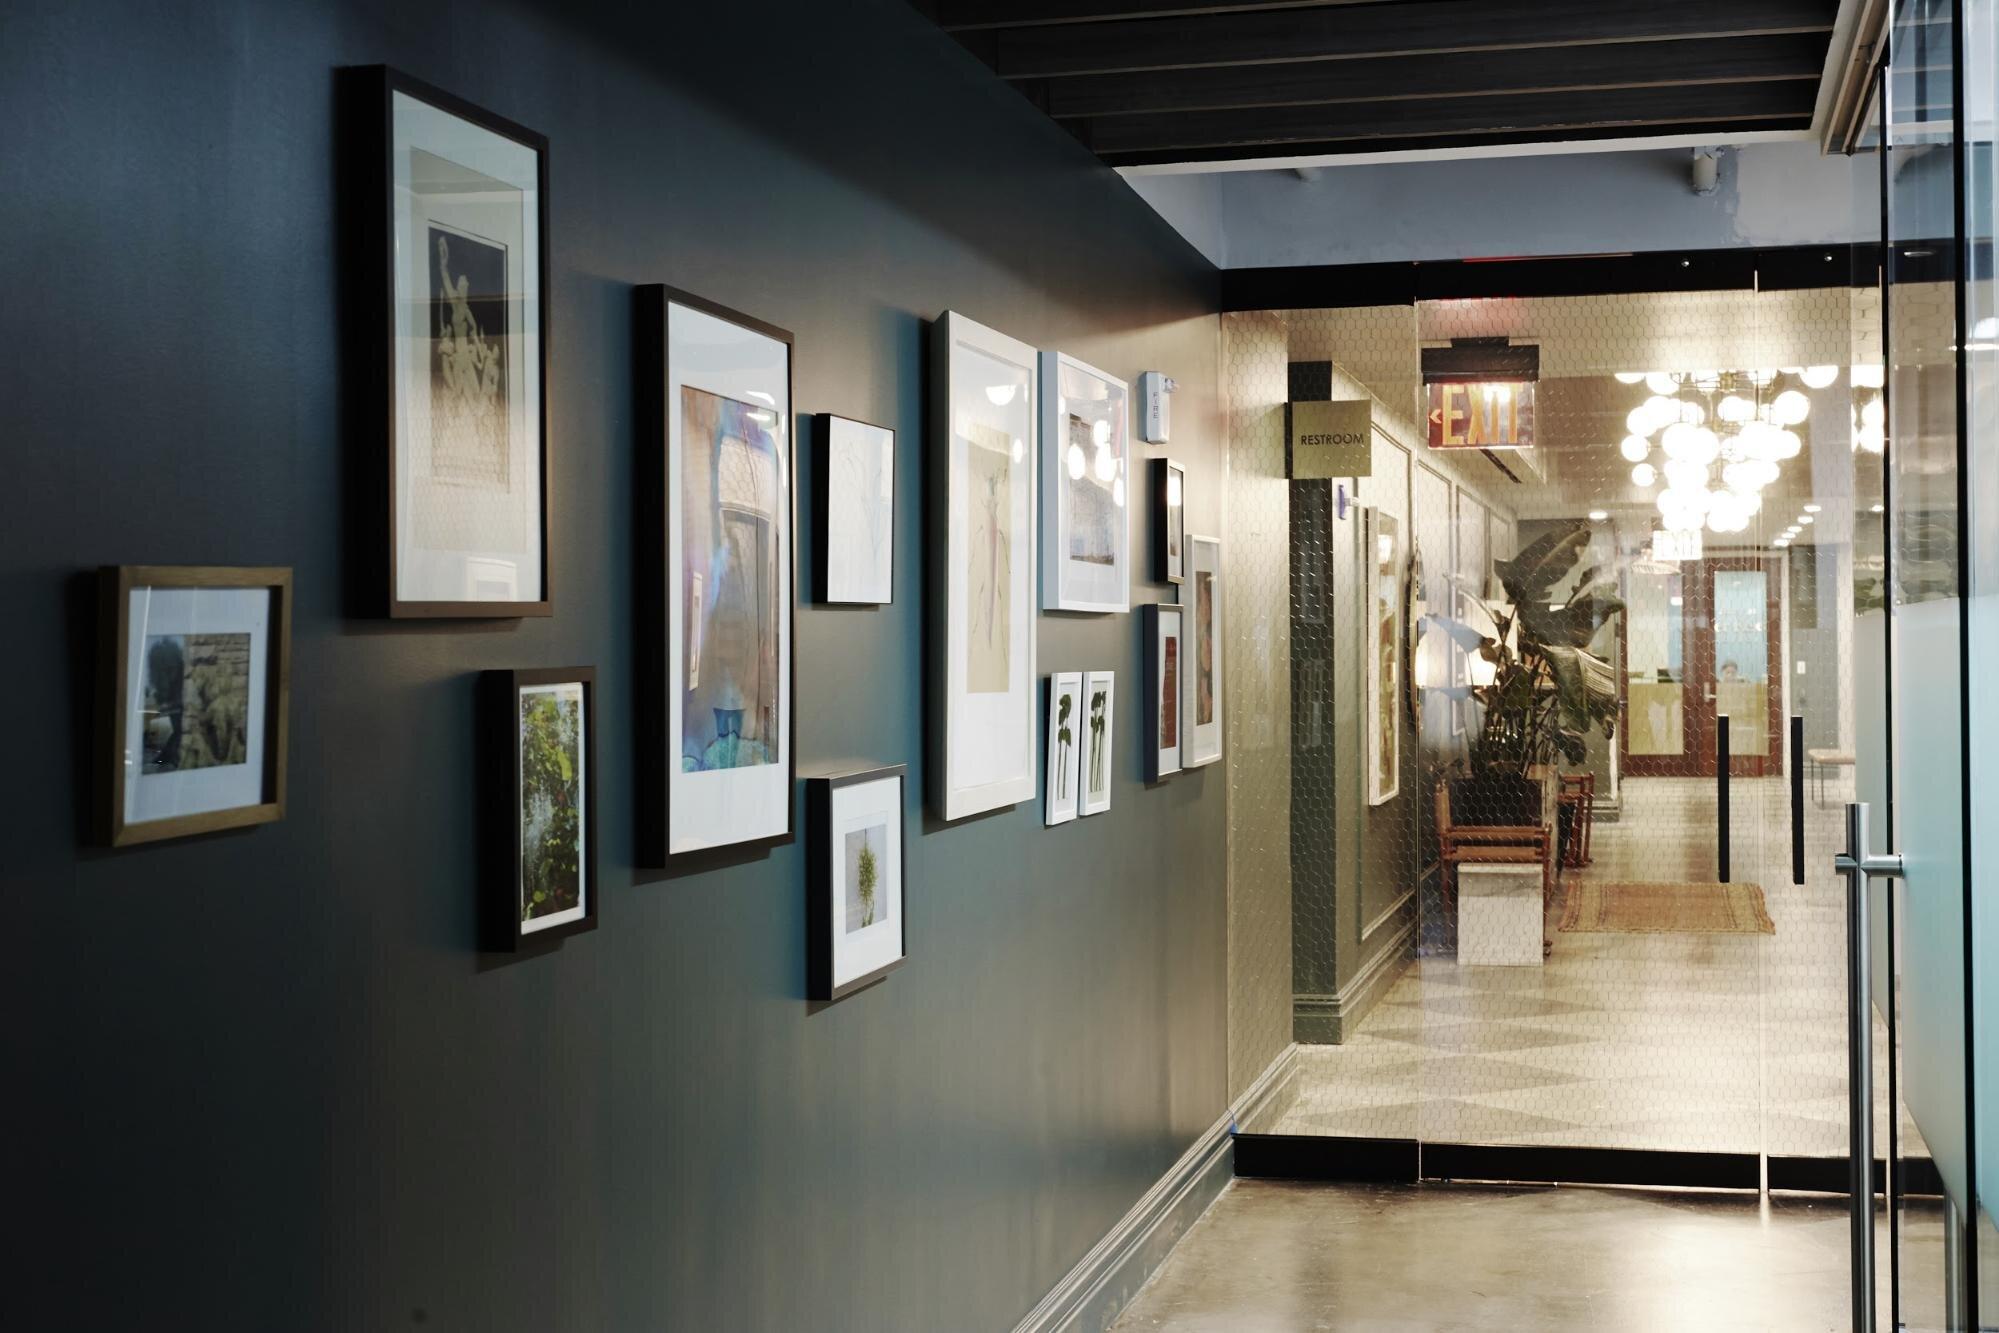 Hallway in a bond collective workspace